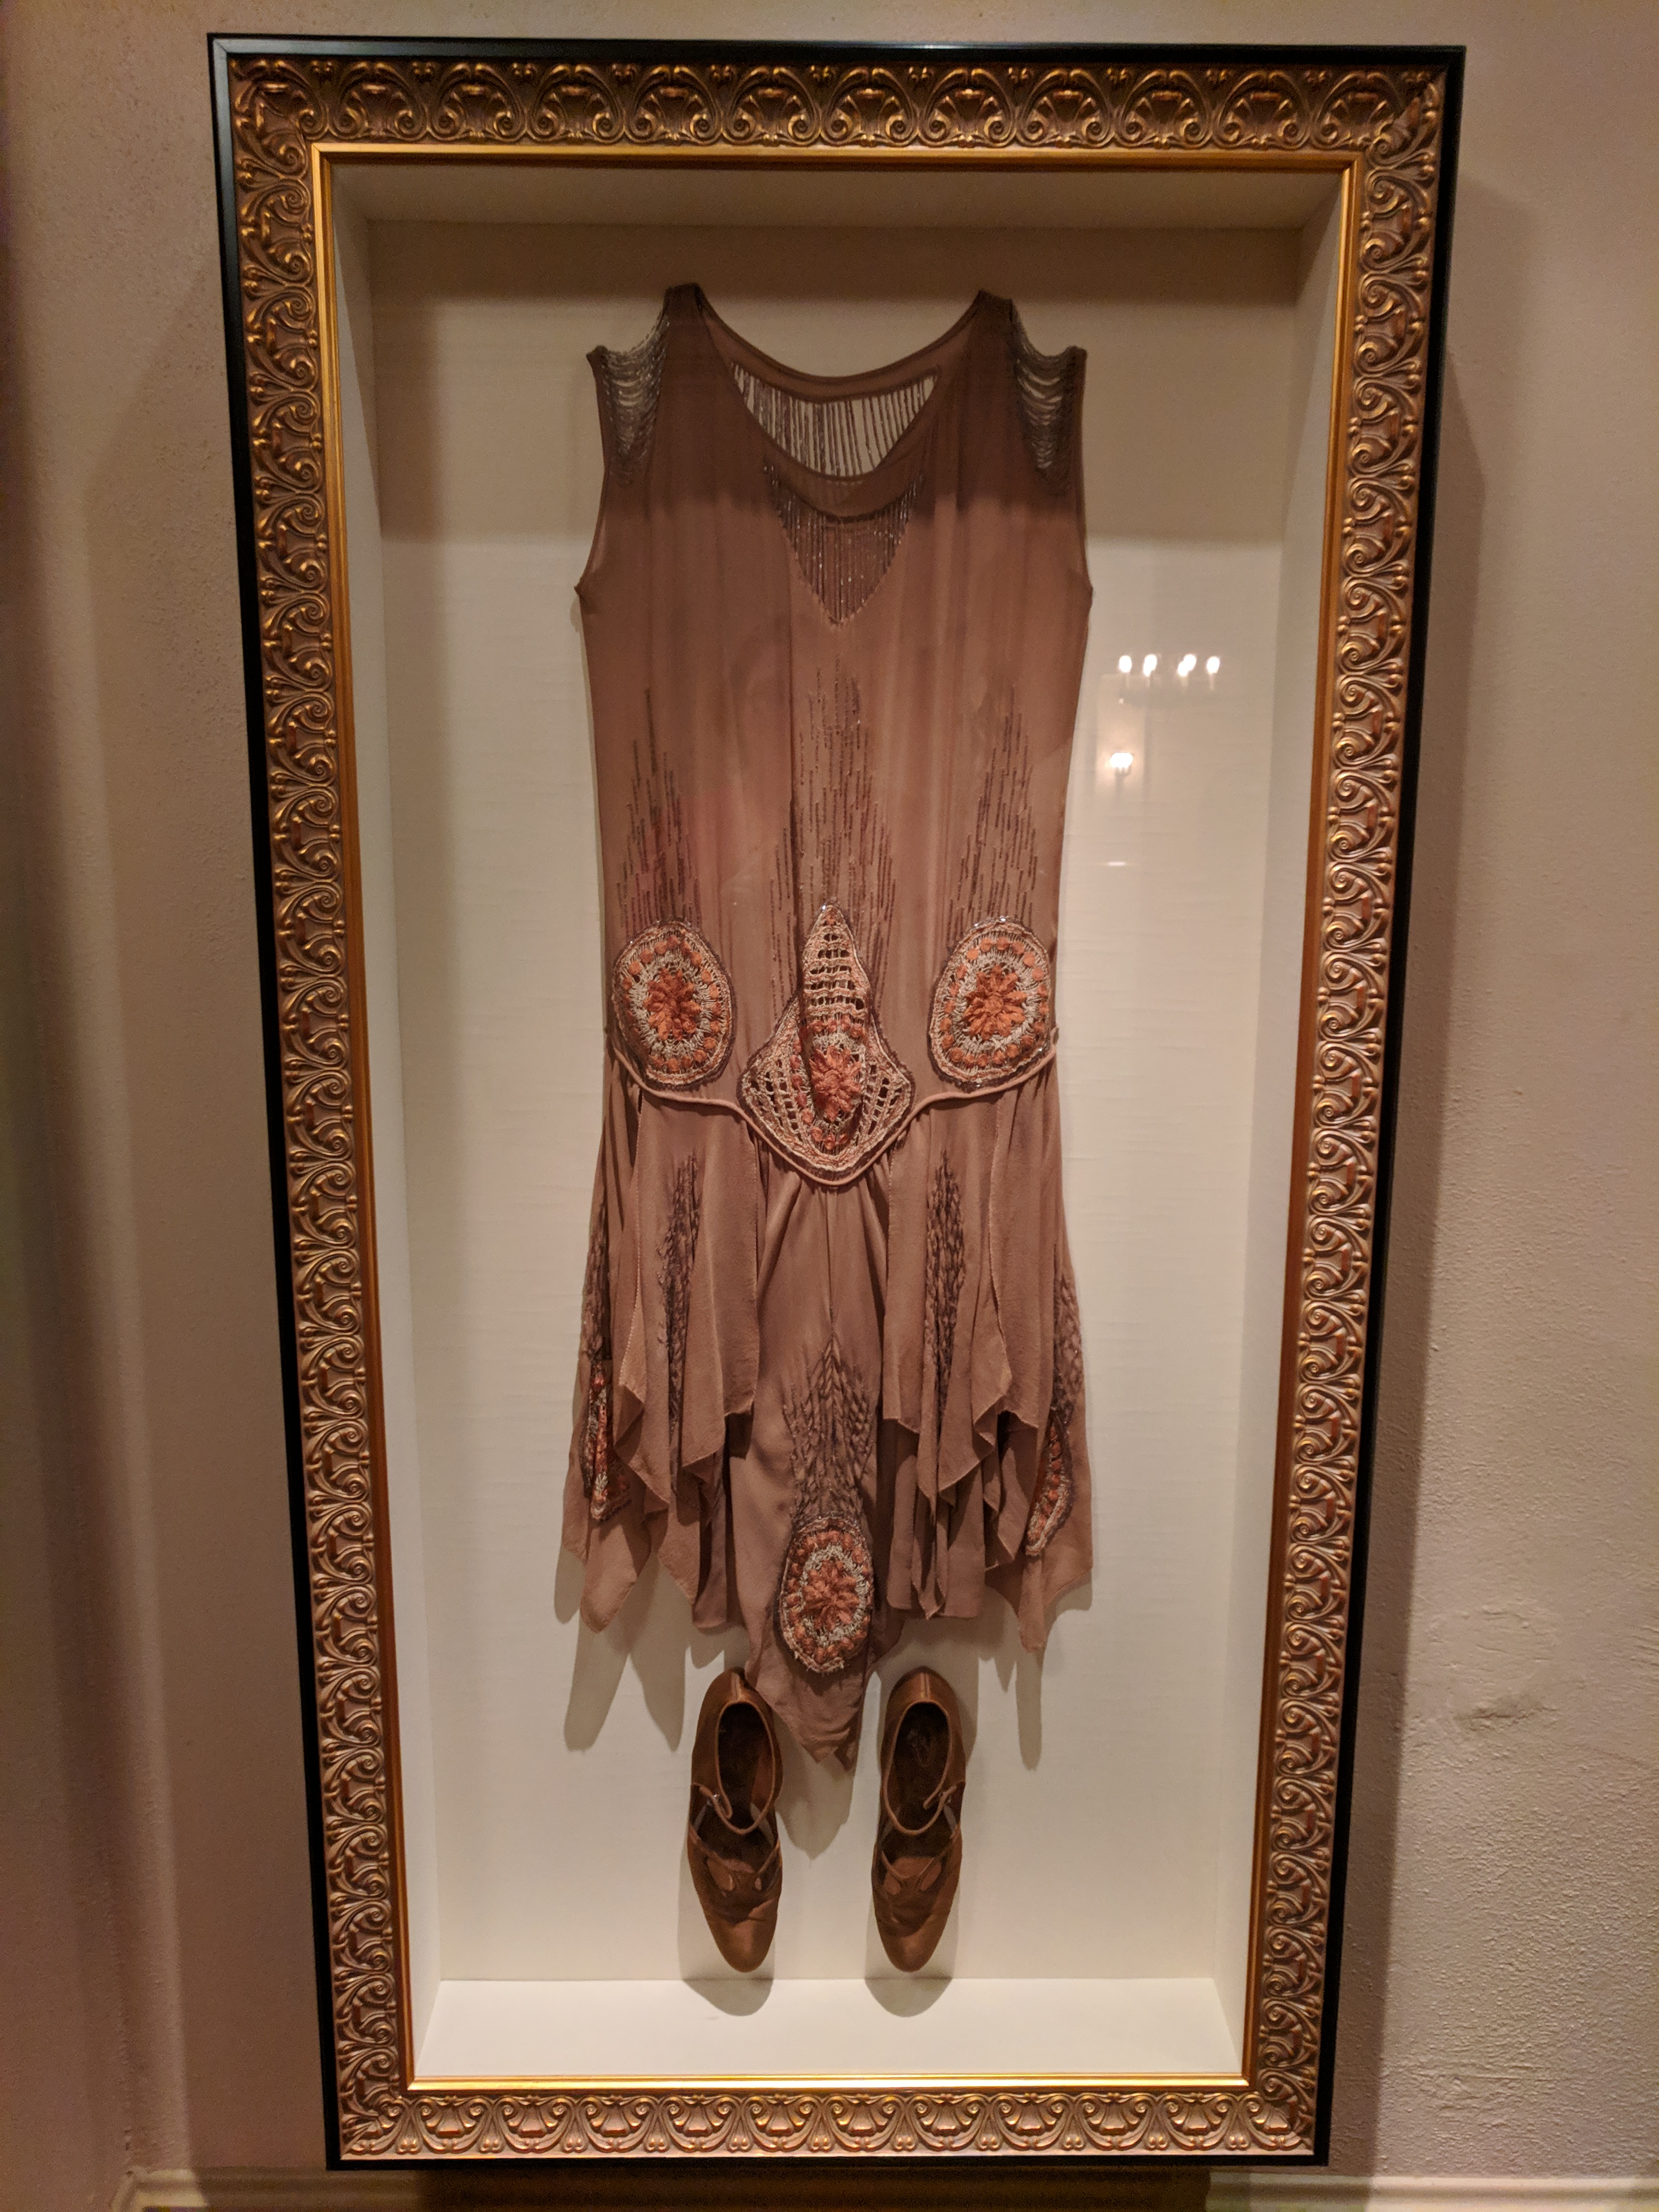 File:Flapper dress at plaza theatre.jpg - Wikimedia Commons